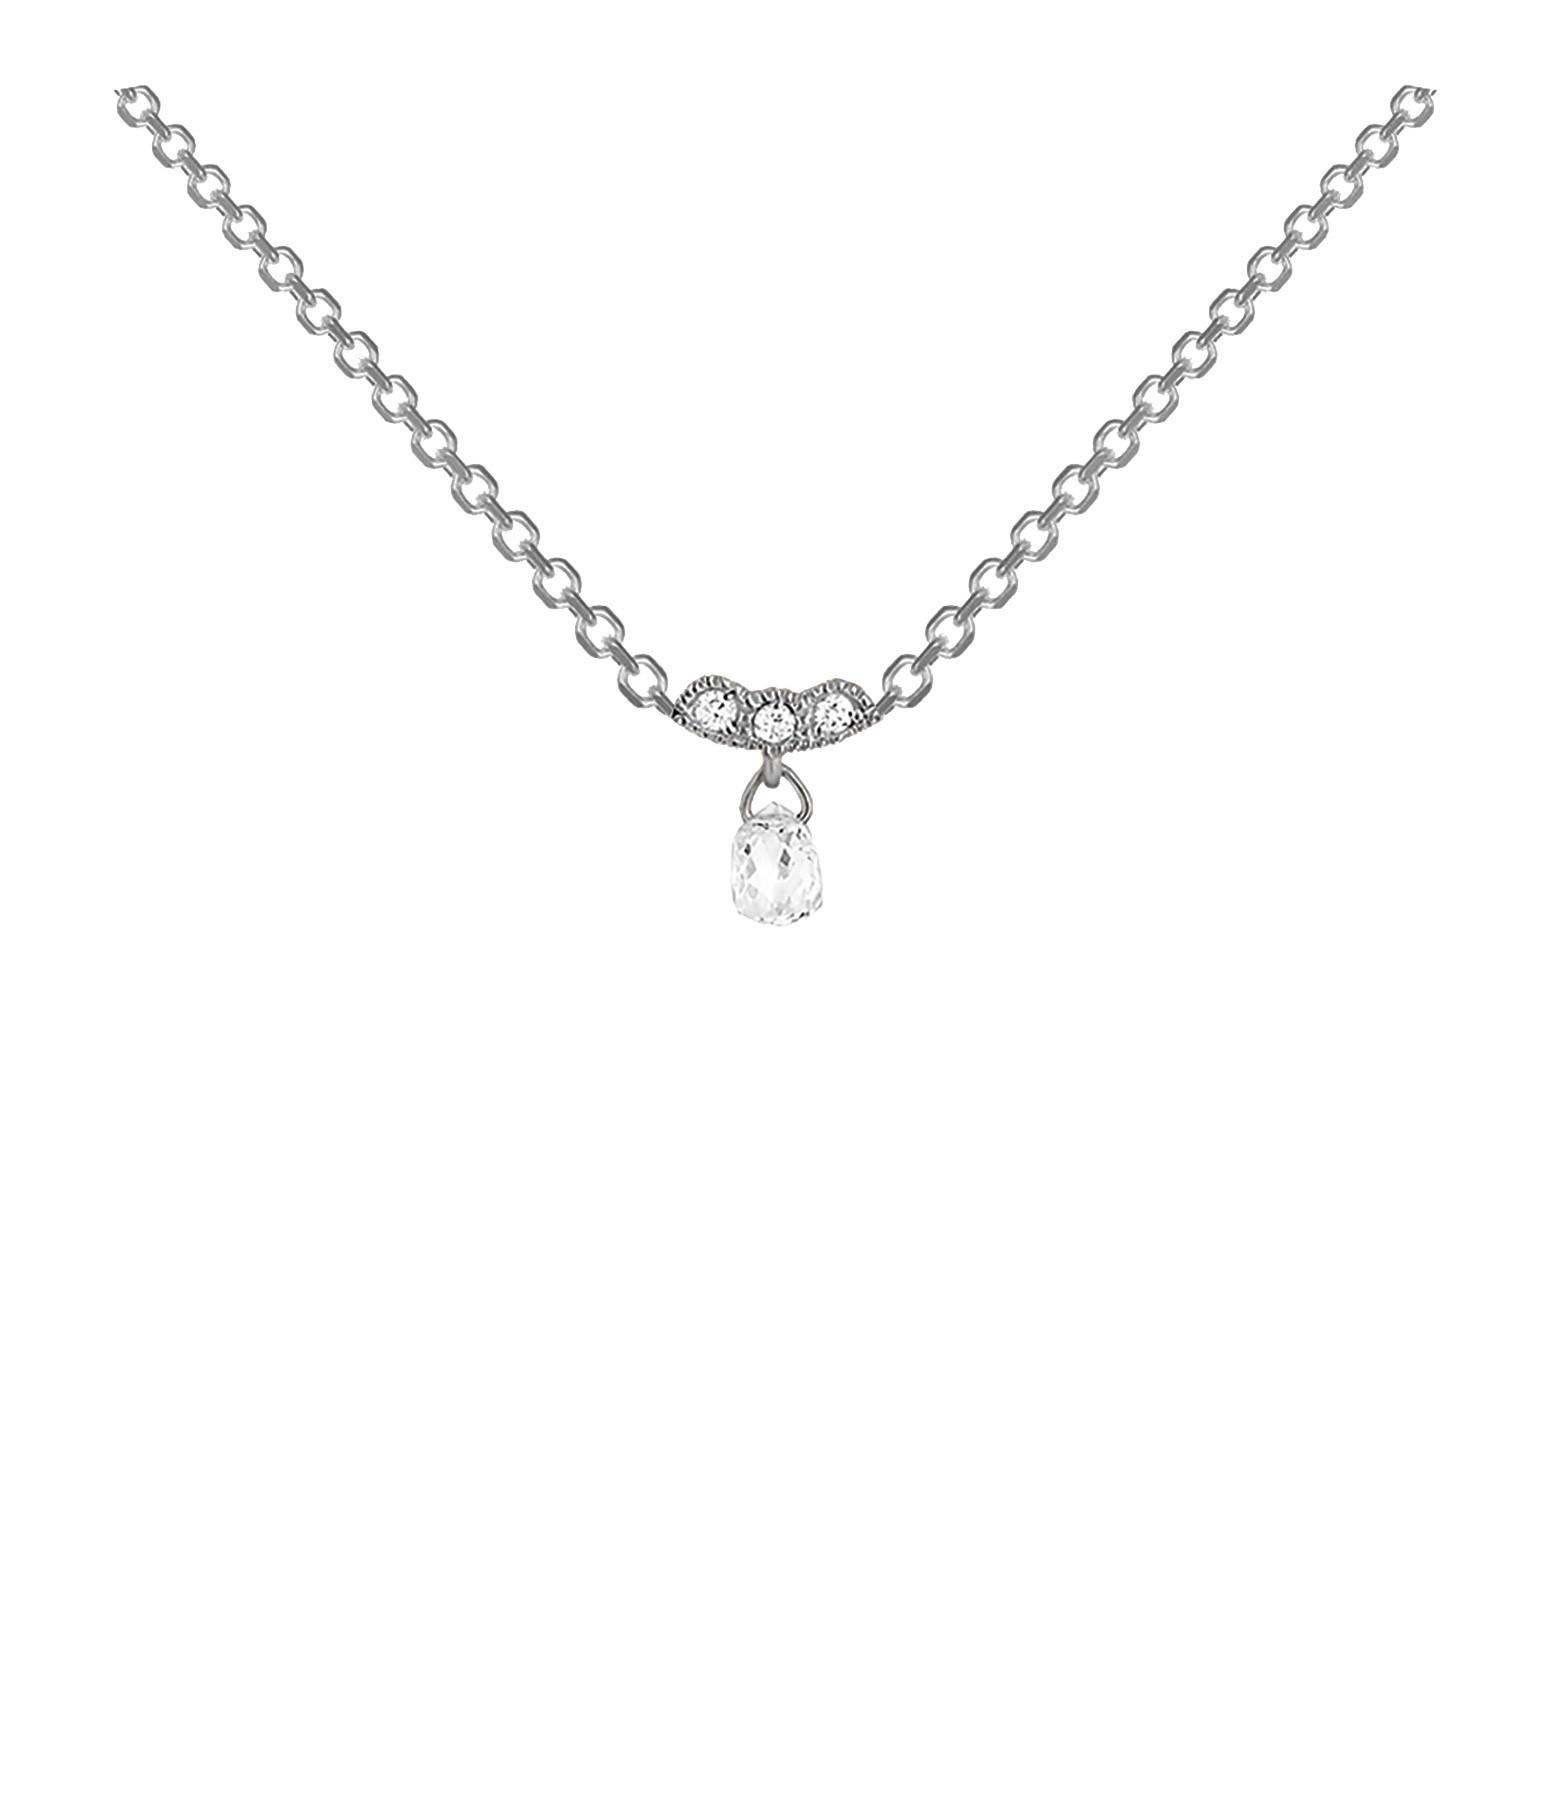 STONE PARIS - Collier Ama Or Diamants Exclusivité Lulli